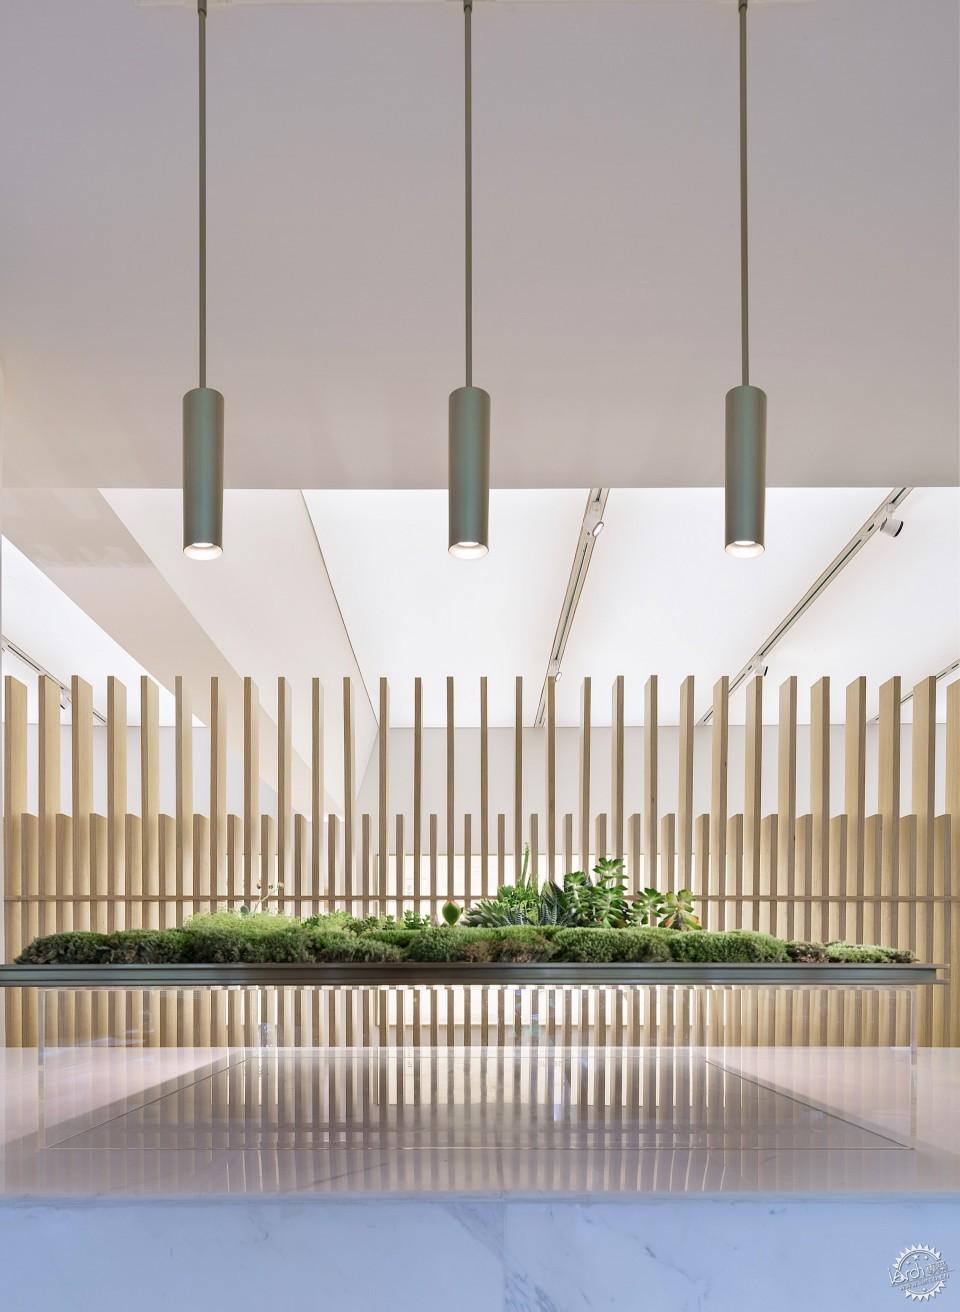 more design office - 室内设计师 / 建筑设计师助理 / 软装设计师